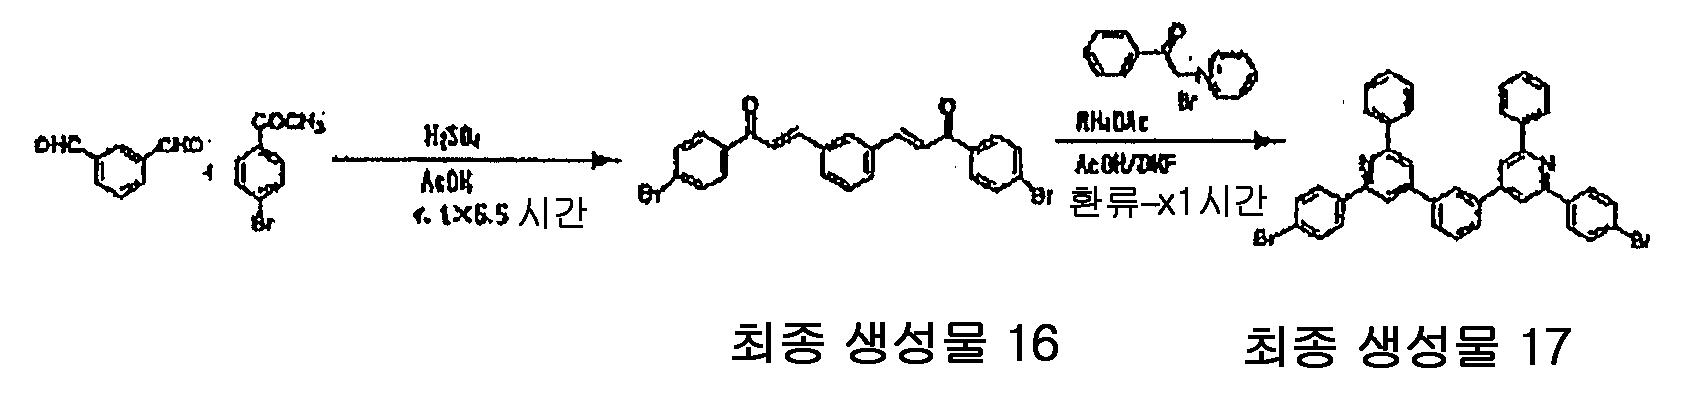 Figure 112010002231902-pat00112